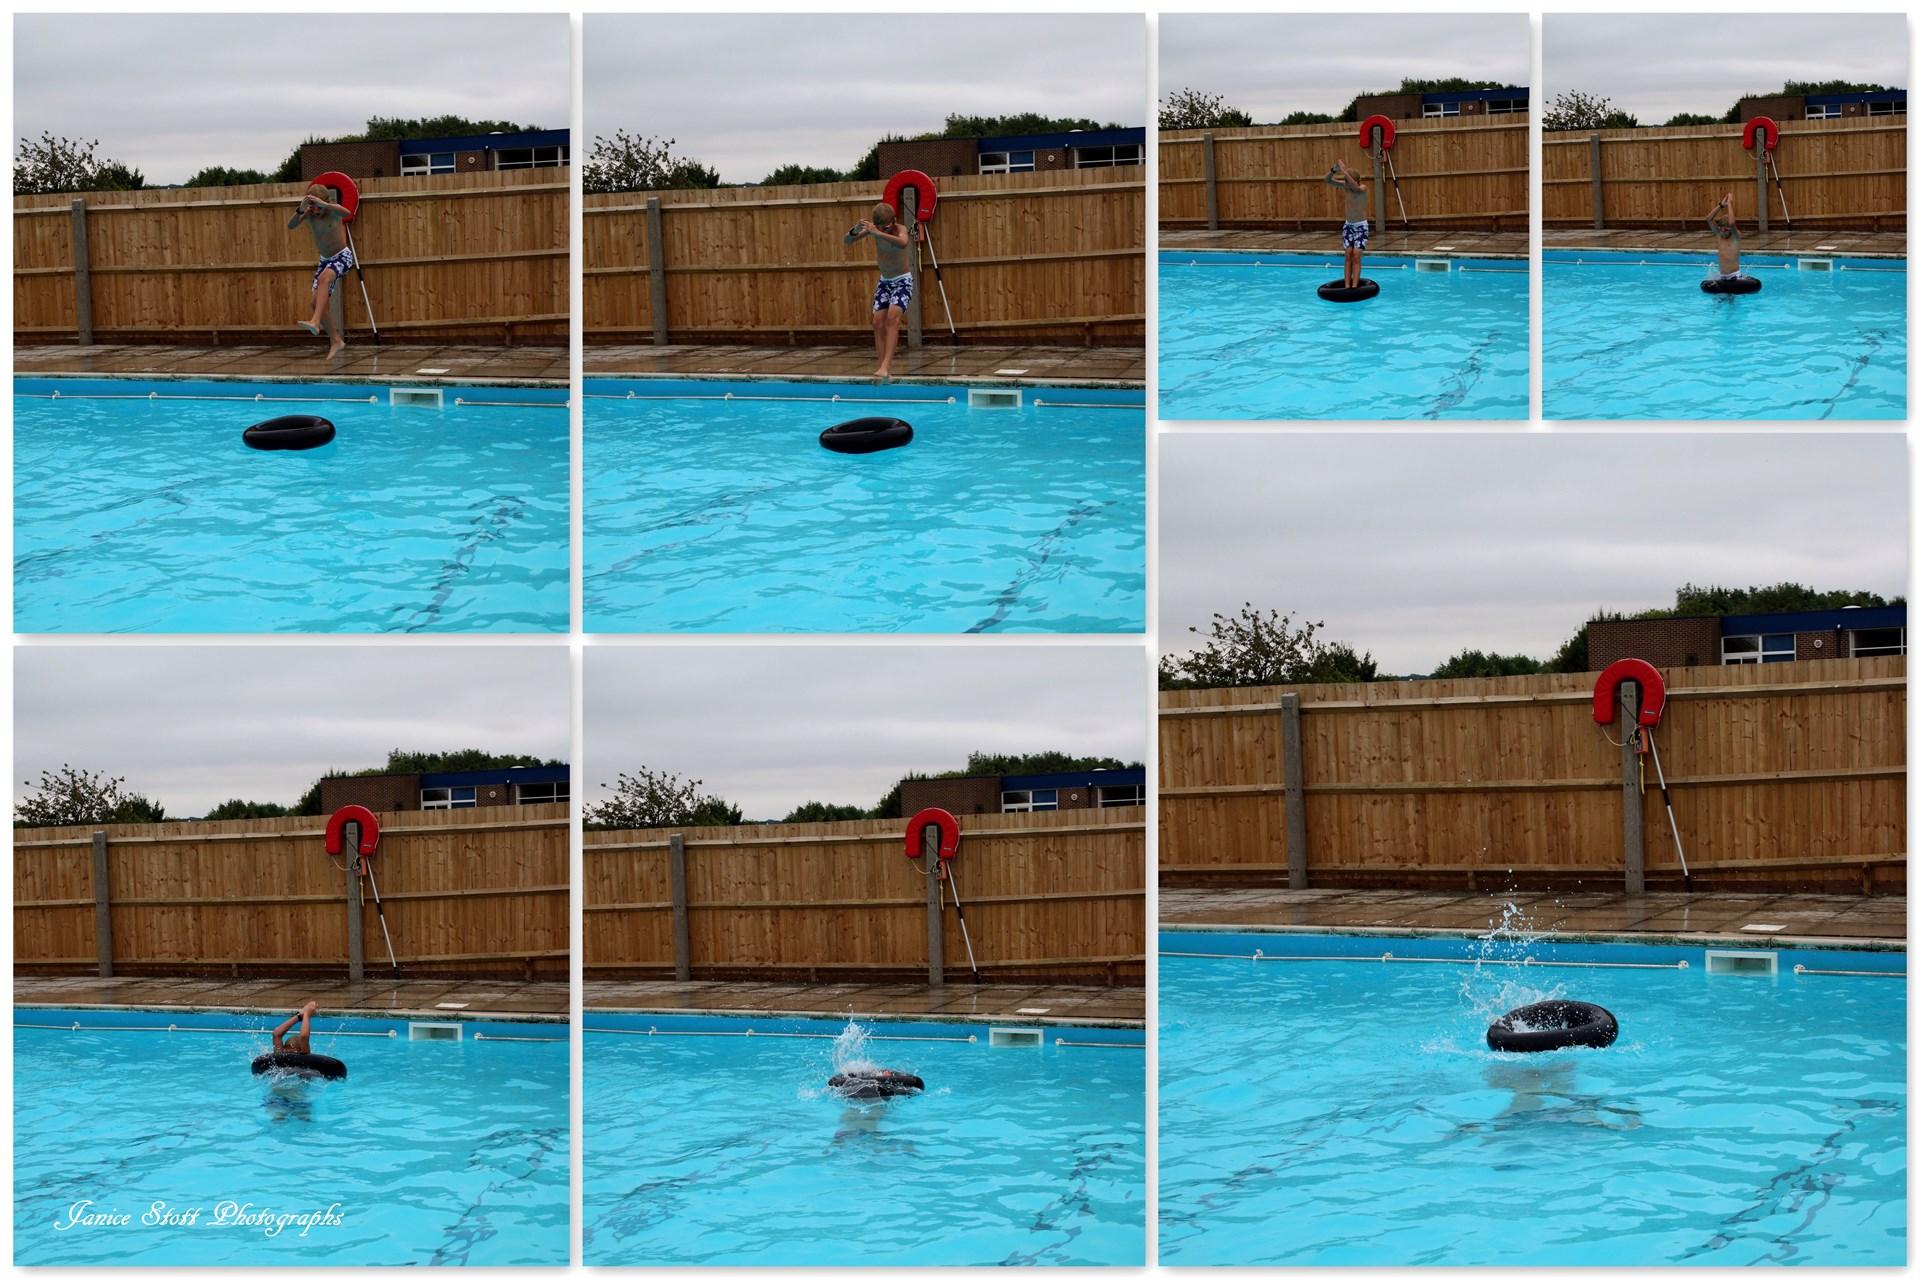 Photos of fun activities at overton pool lordsfield - Club mahindra kandaghat swimming pool ...